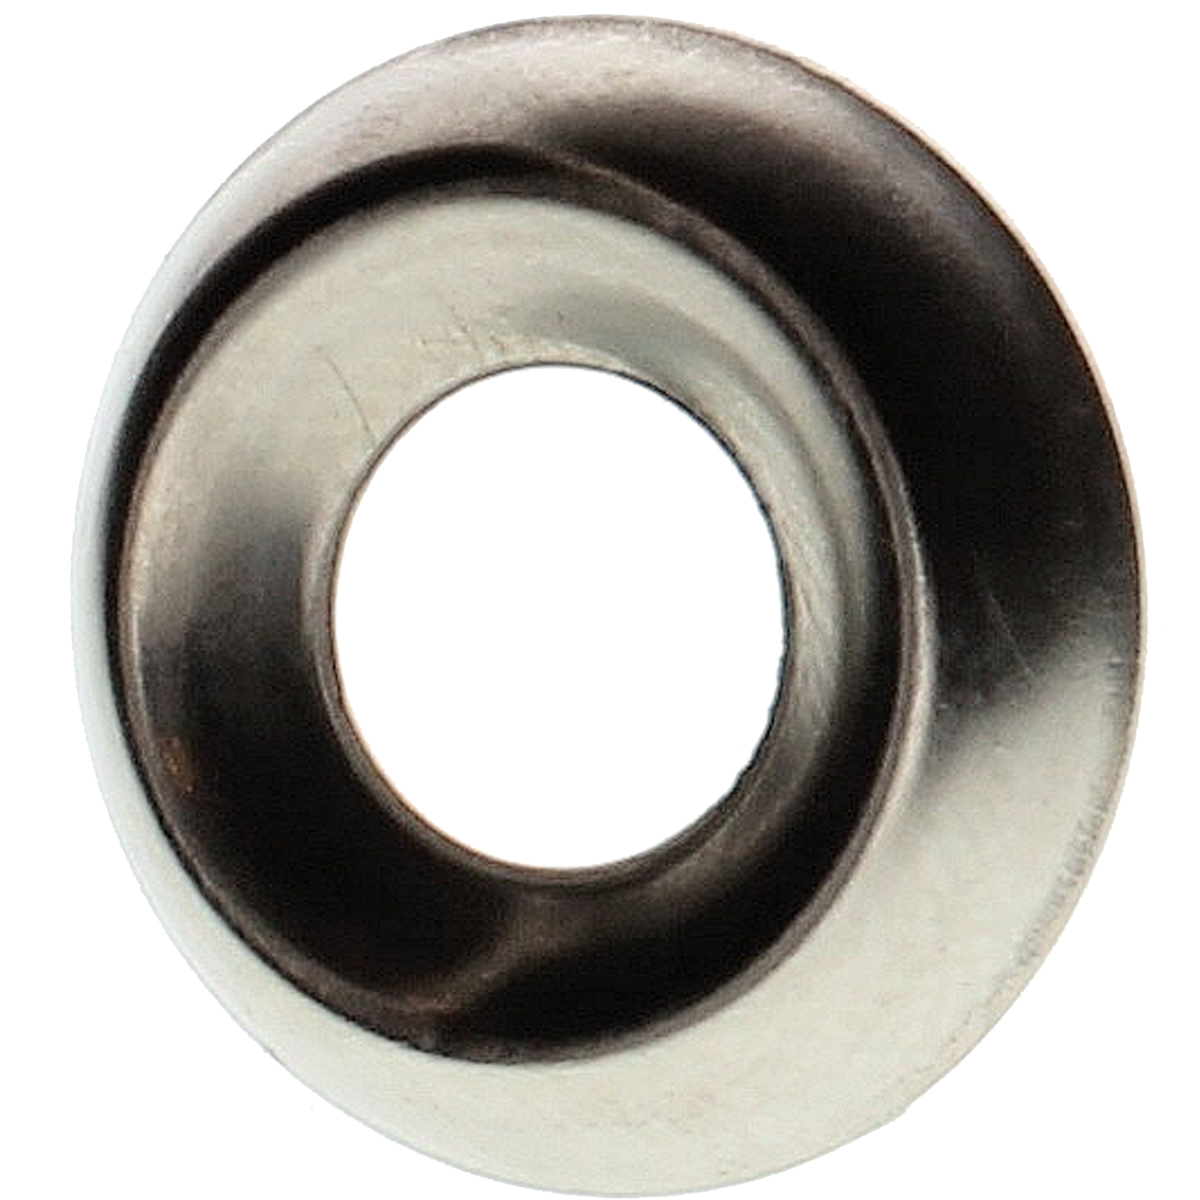 #12 Countersunk Finishing Washers — Nickel Brass, 100/PKG